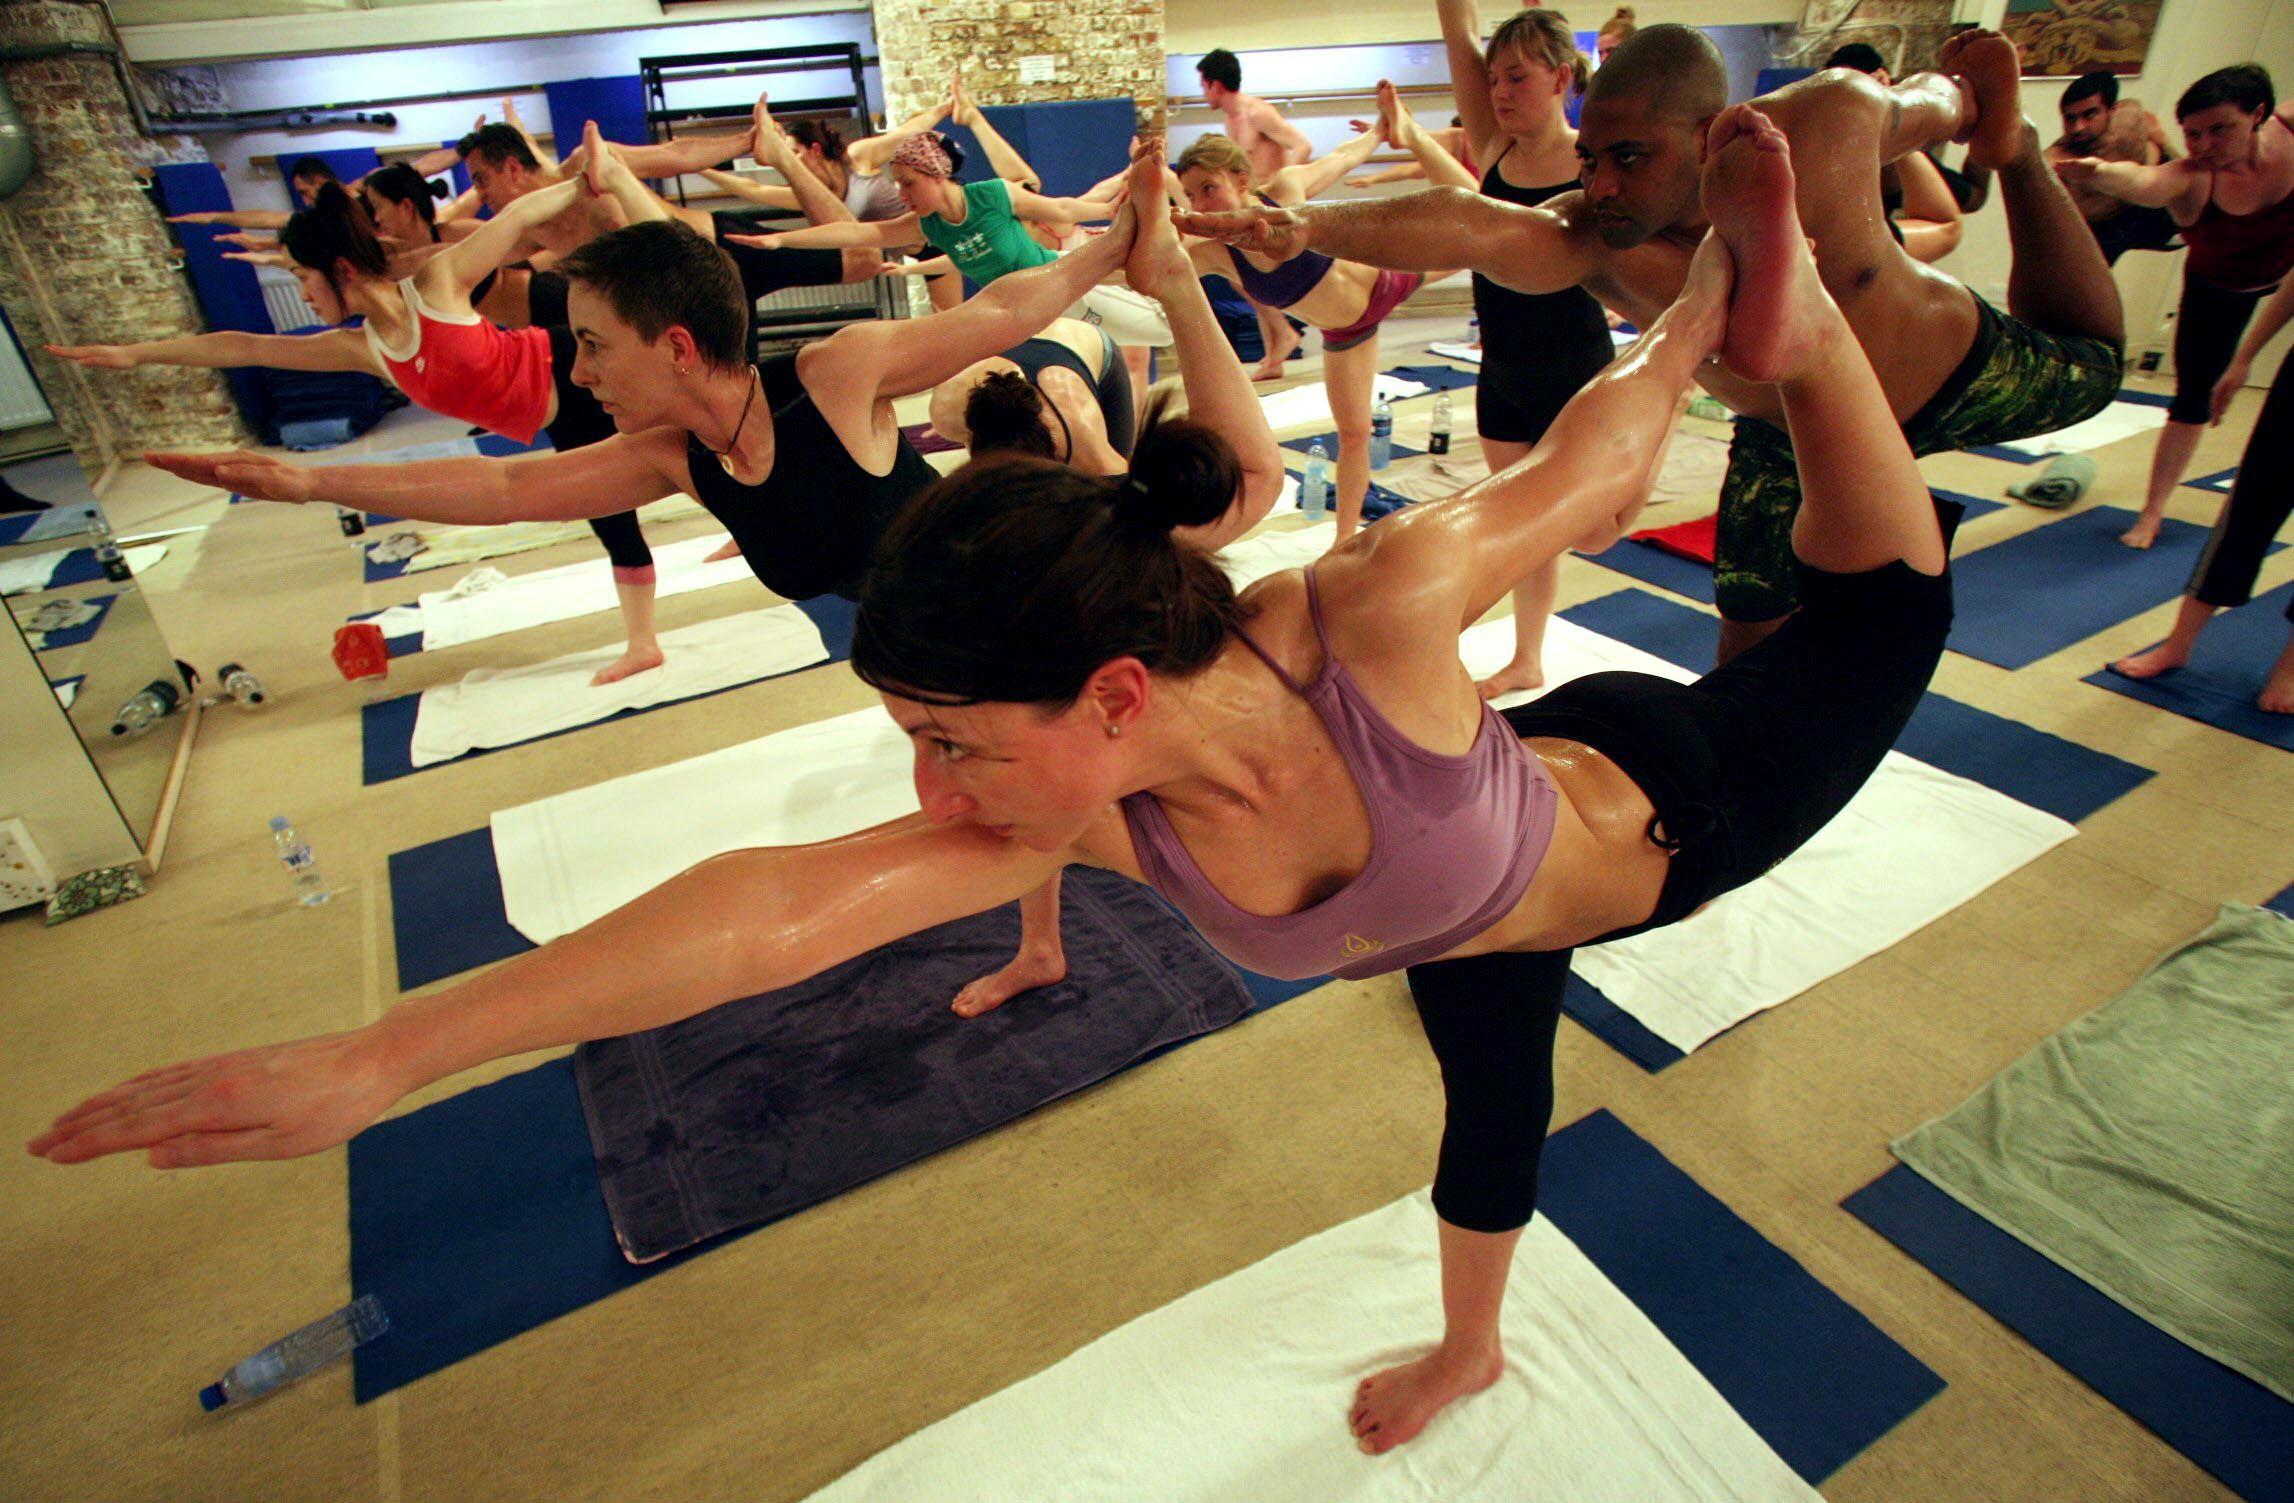 Bikram yoga founder bikram choudhury sexual harassment